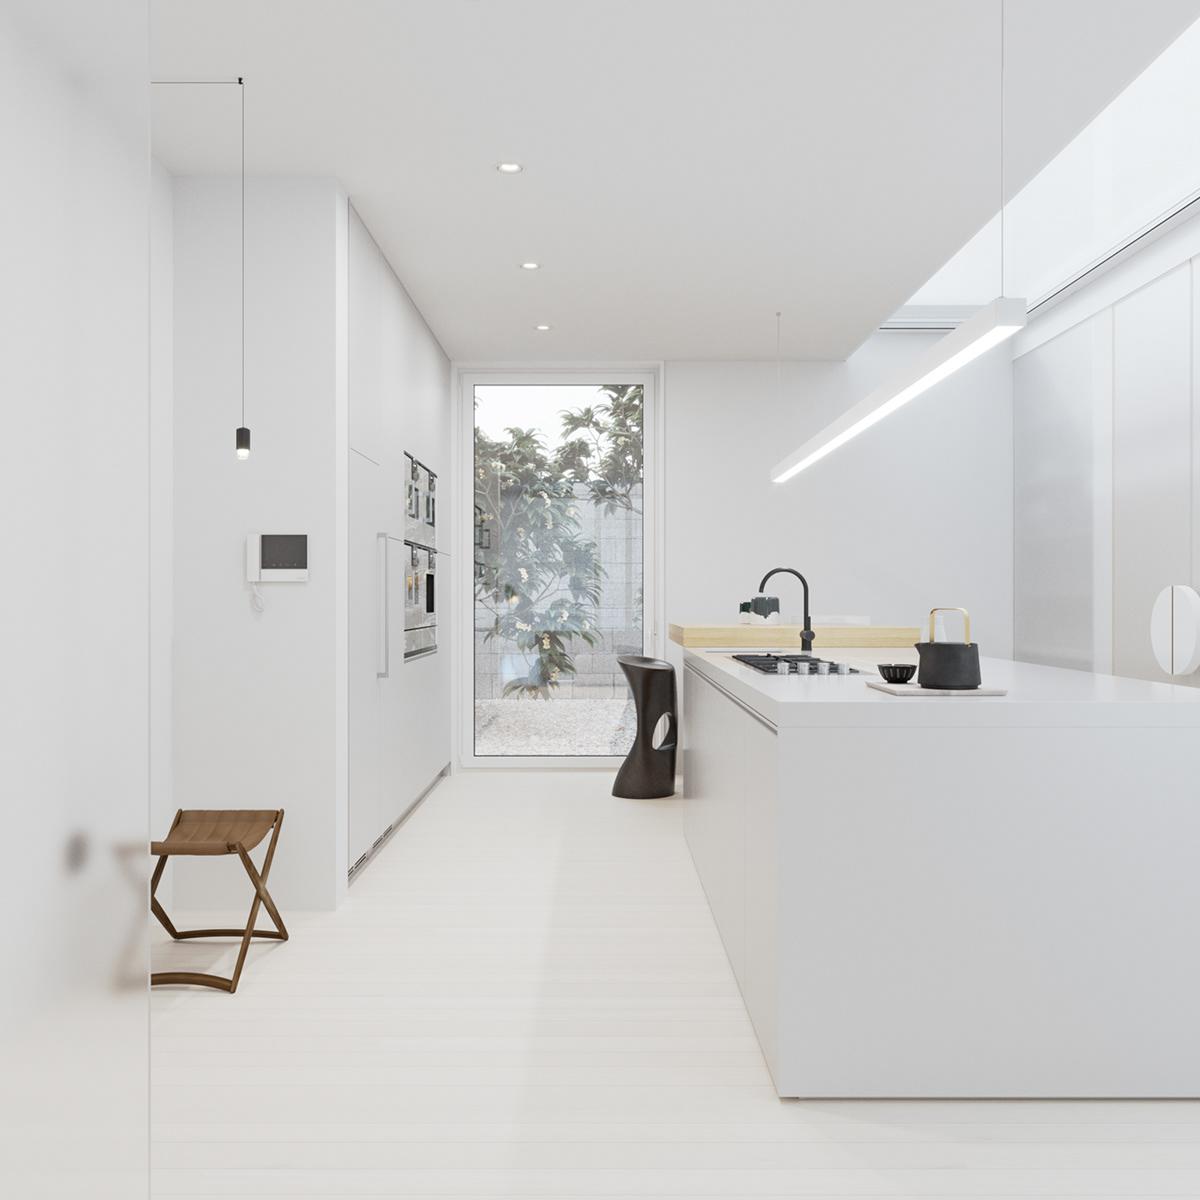 LAB House Interiors On Behance